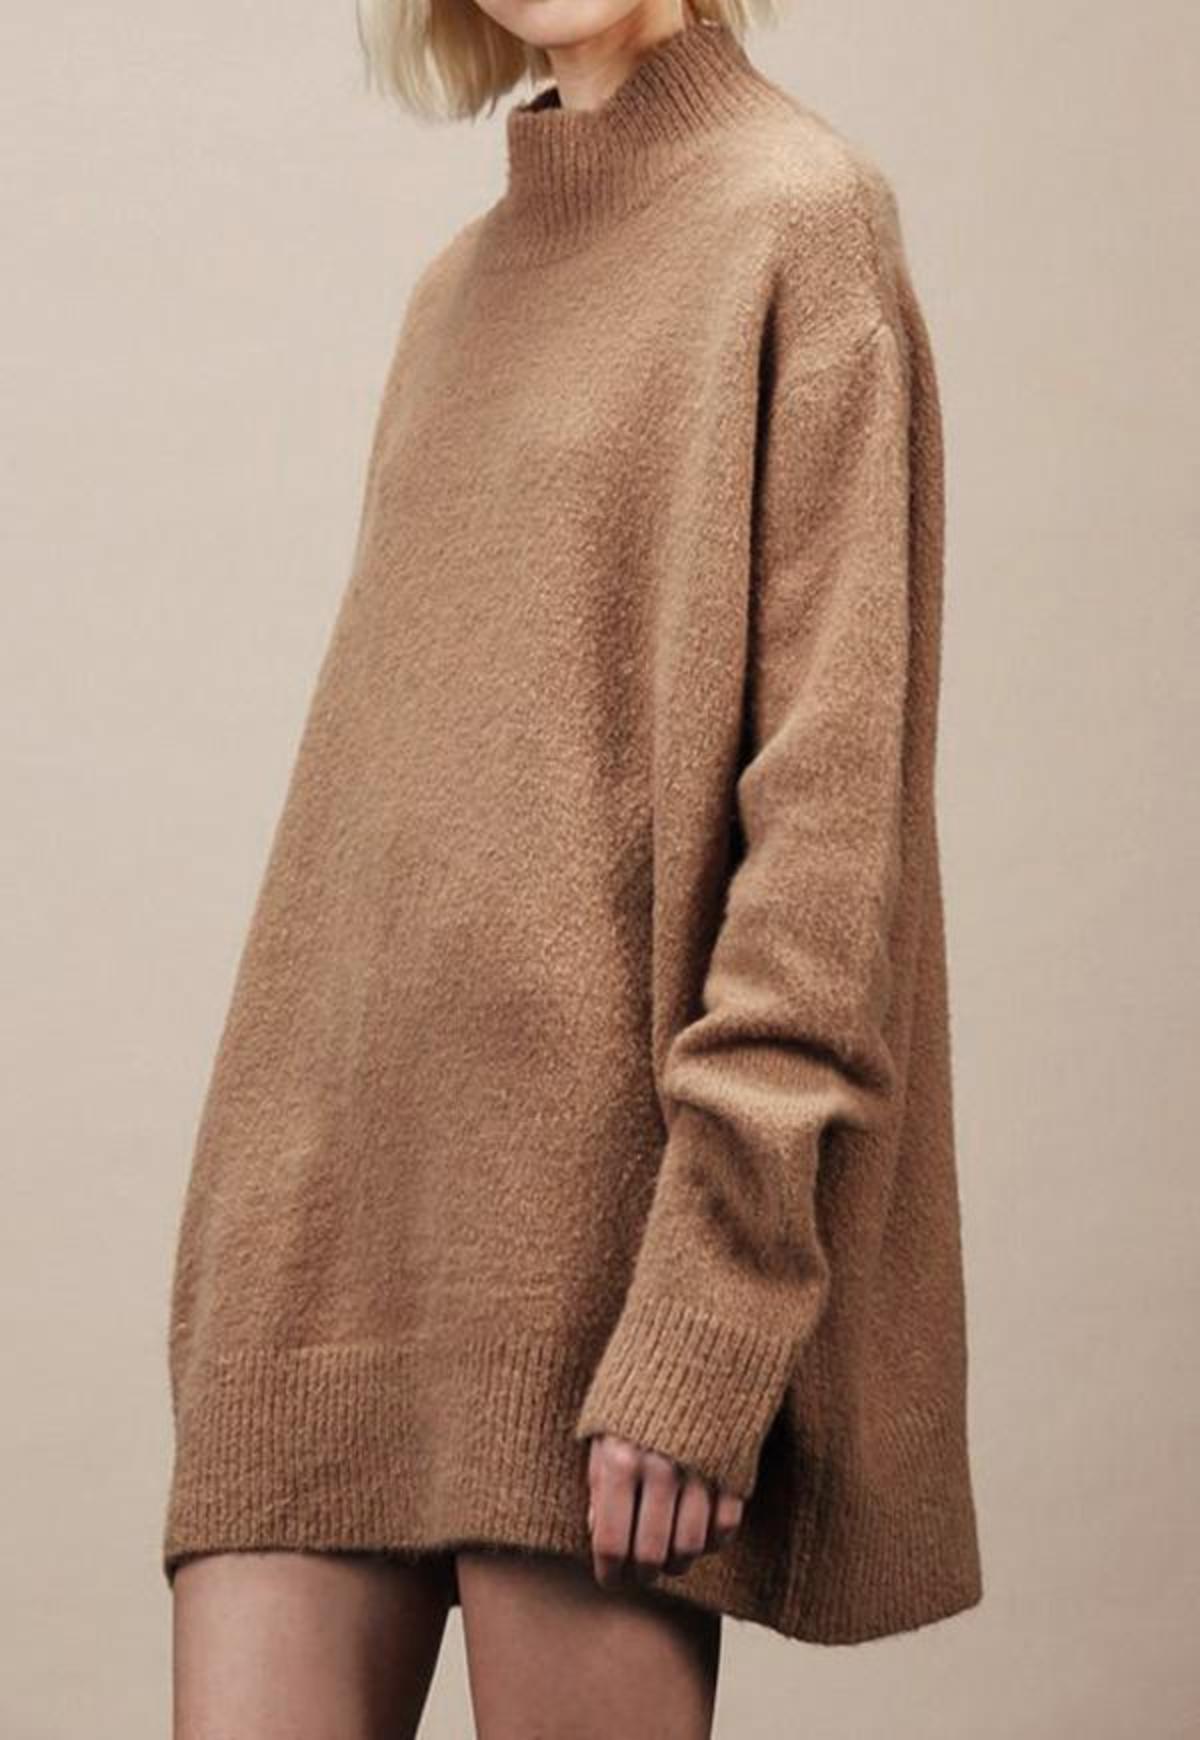 Again Tyler Sweater, WAS $165 - NOW $110 @garmentory.com